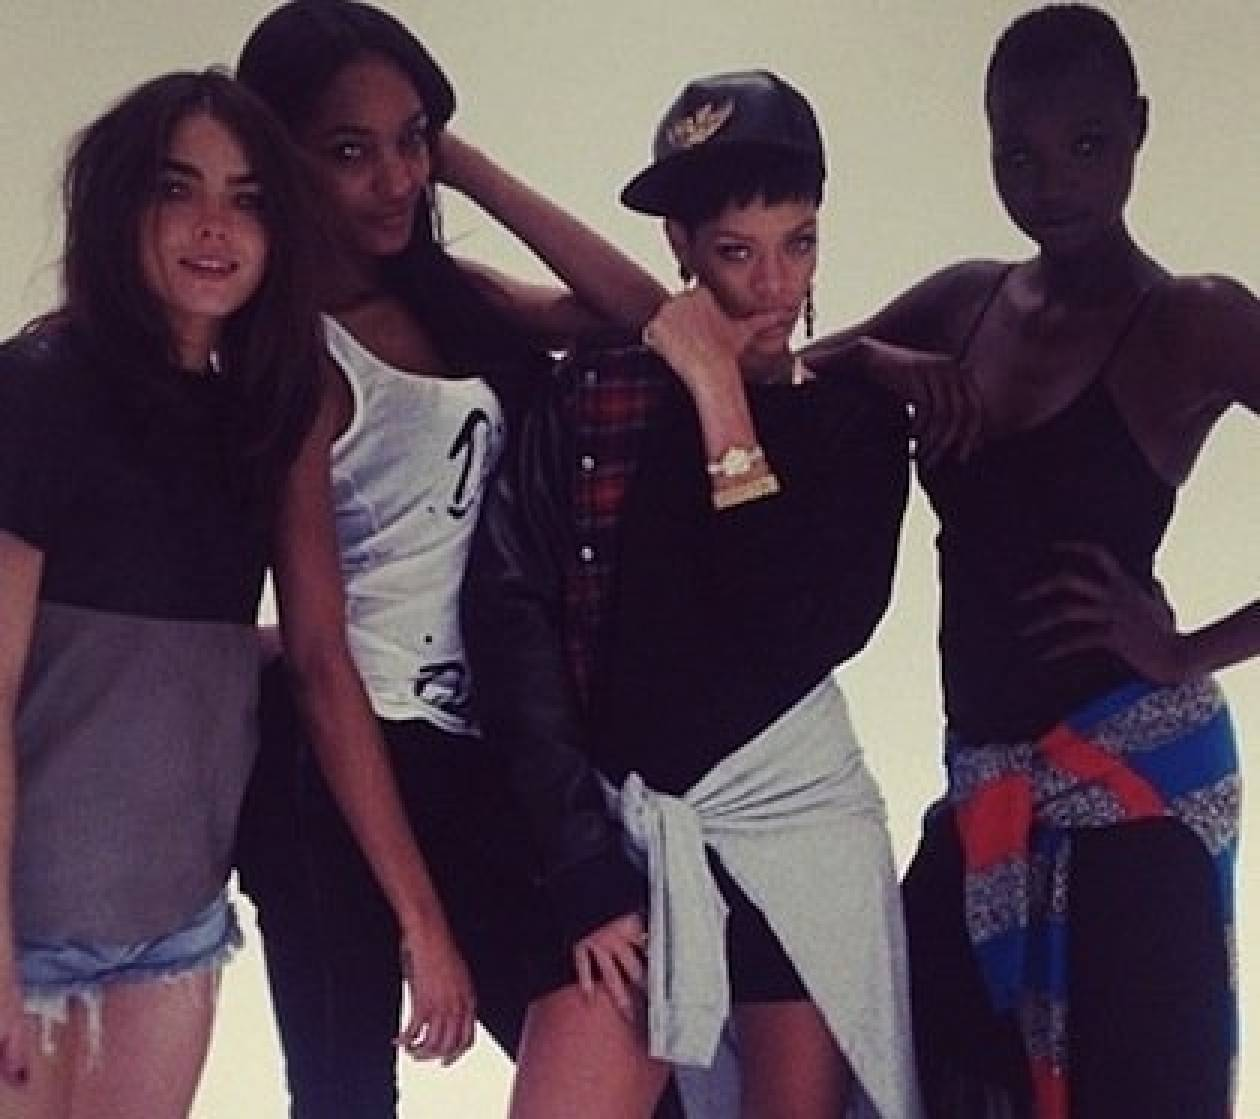 Oι πρώτες εικόνες από τη συλλογή της Rihanna για το River Island